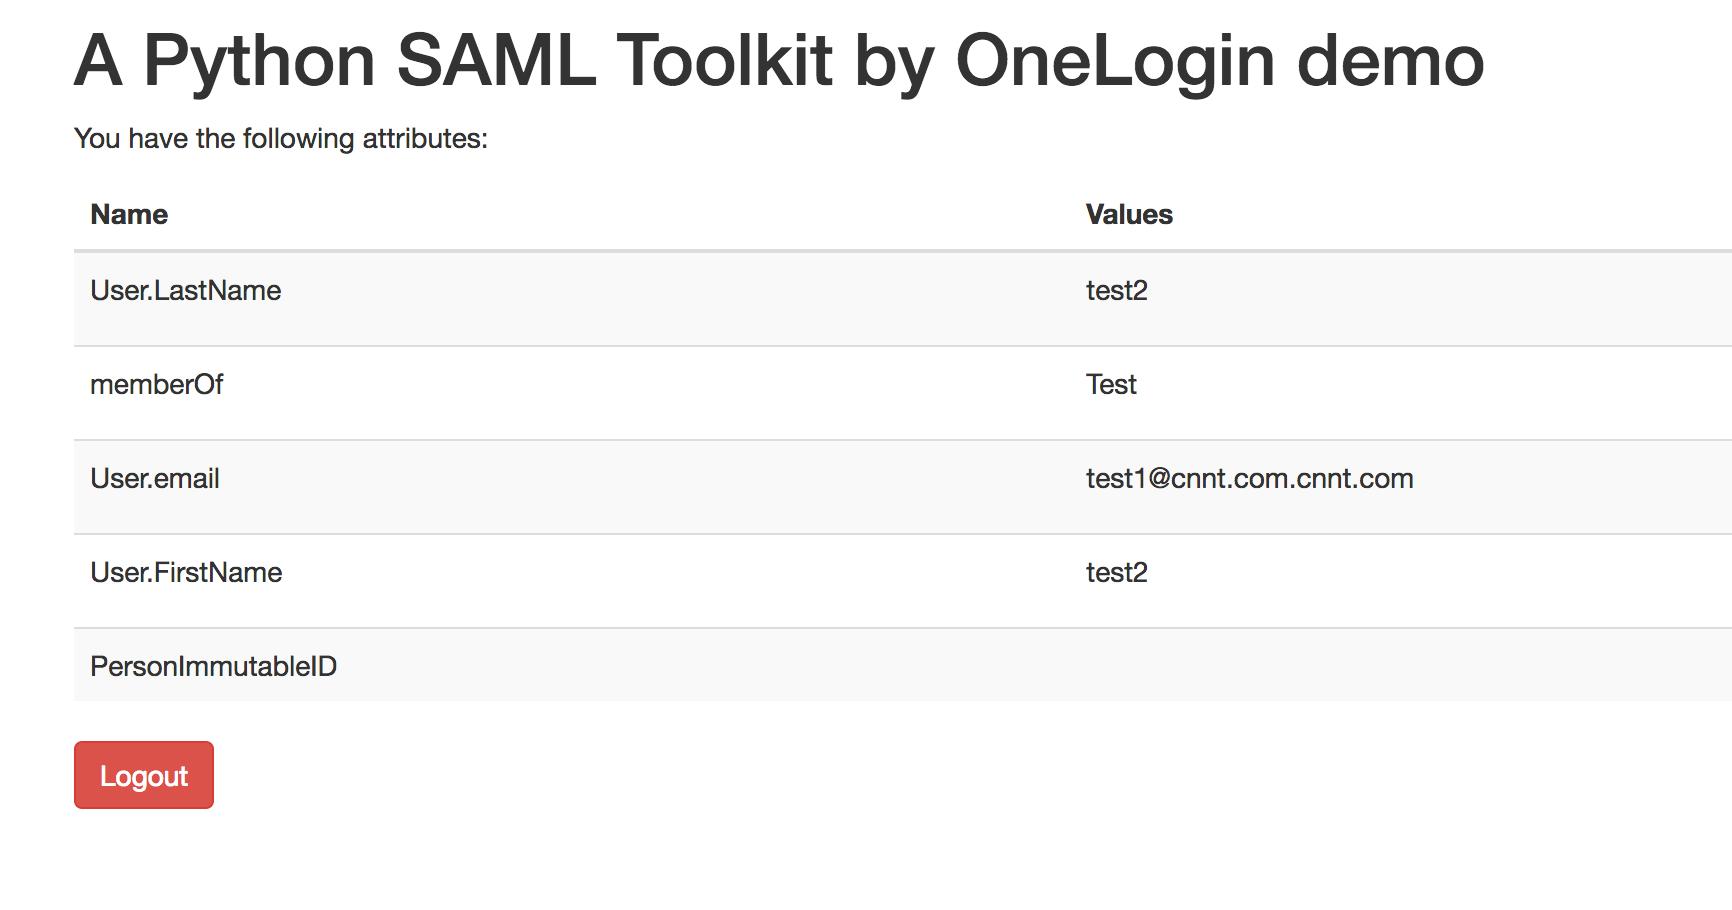 Python-SAML | 安全小飞侠的窝